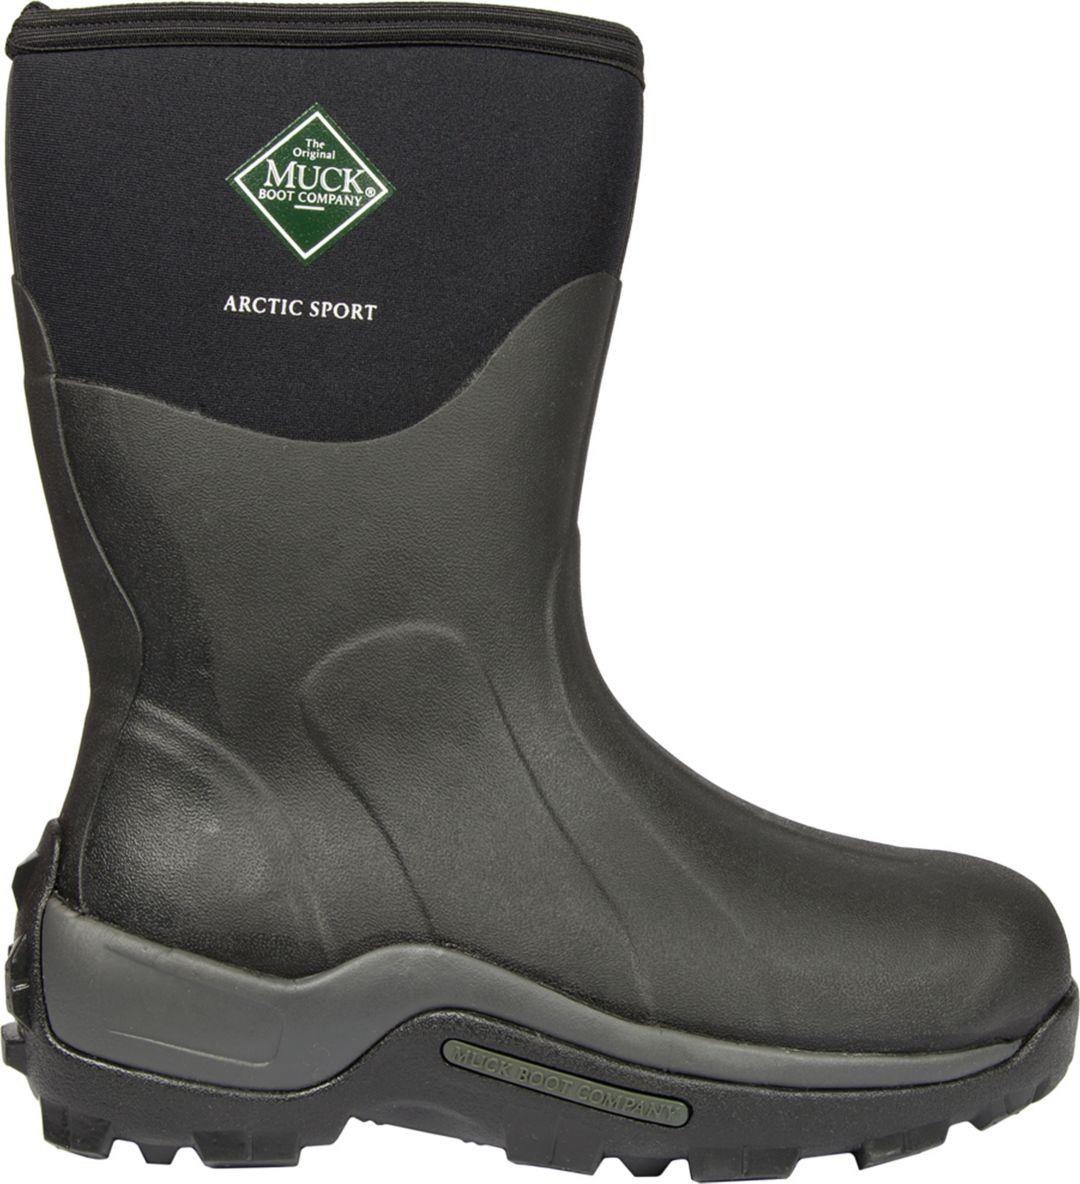 b094fca4c Muck Boots Men's Arctic Sport Mid Insulated Waterproof Winter Boots ...